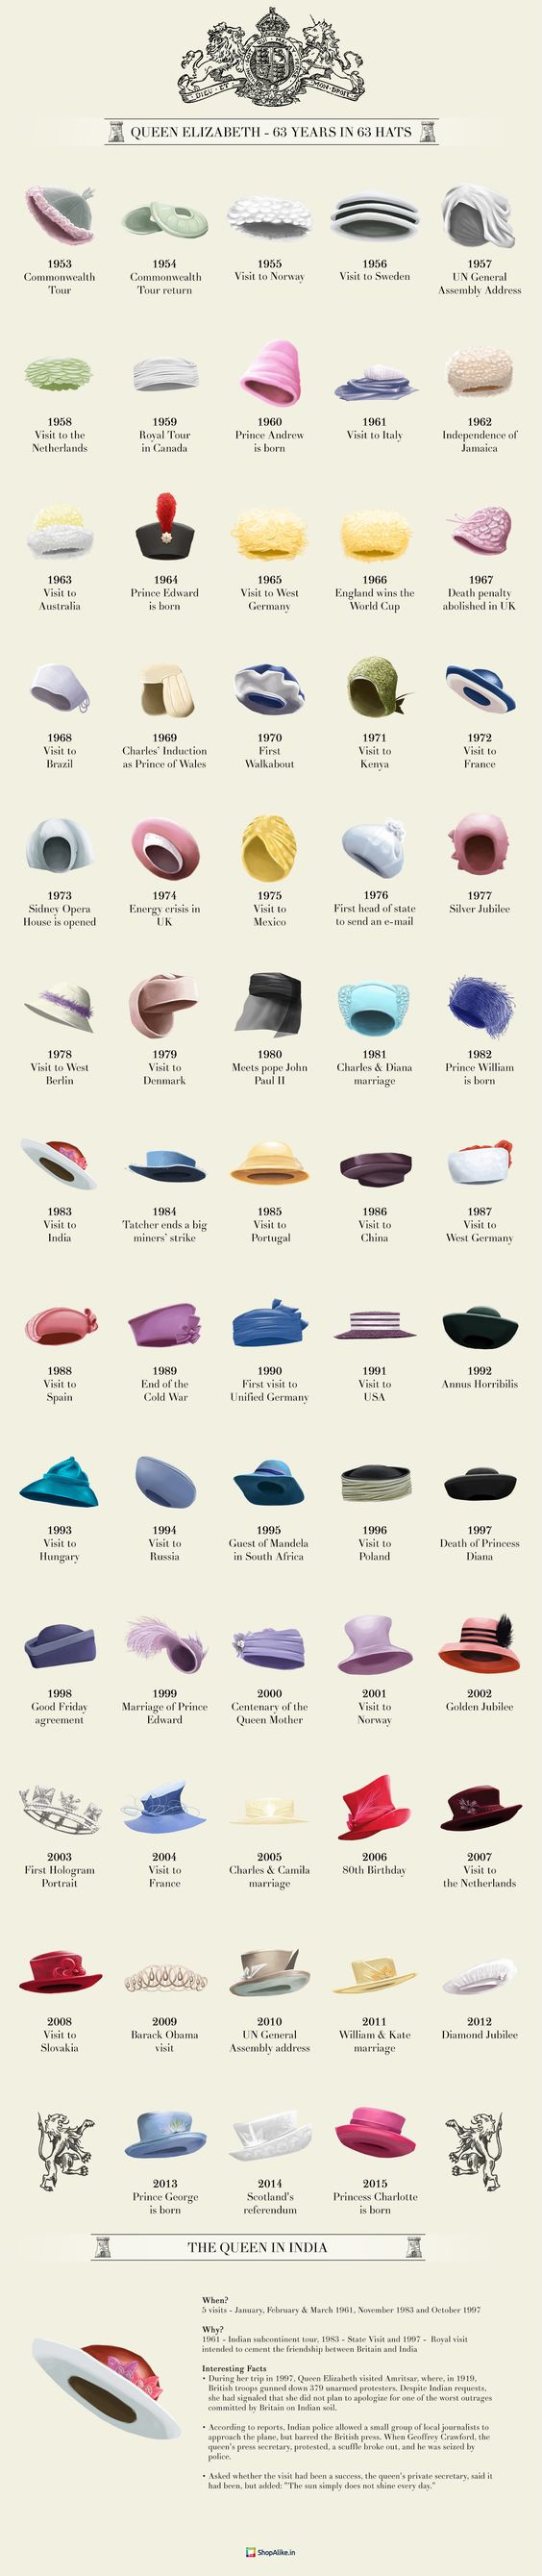 sombreros reina de inglaterra